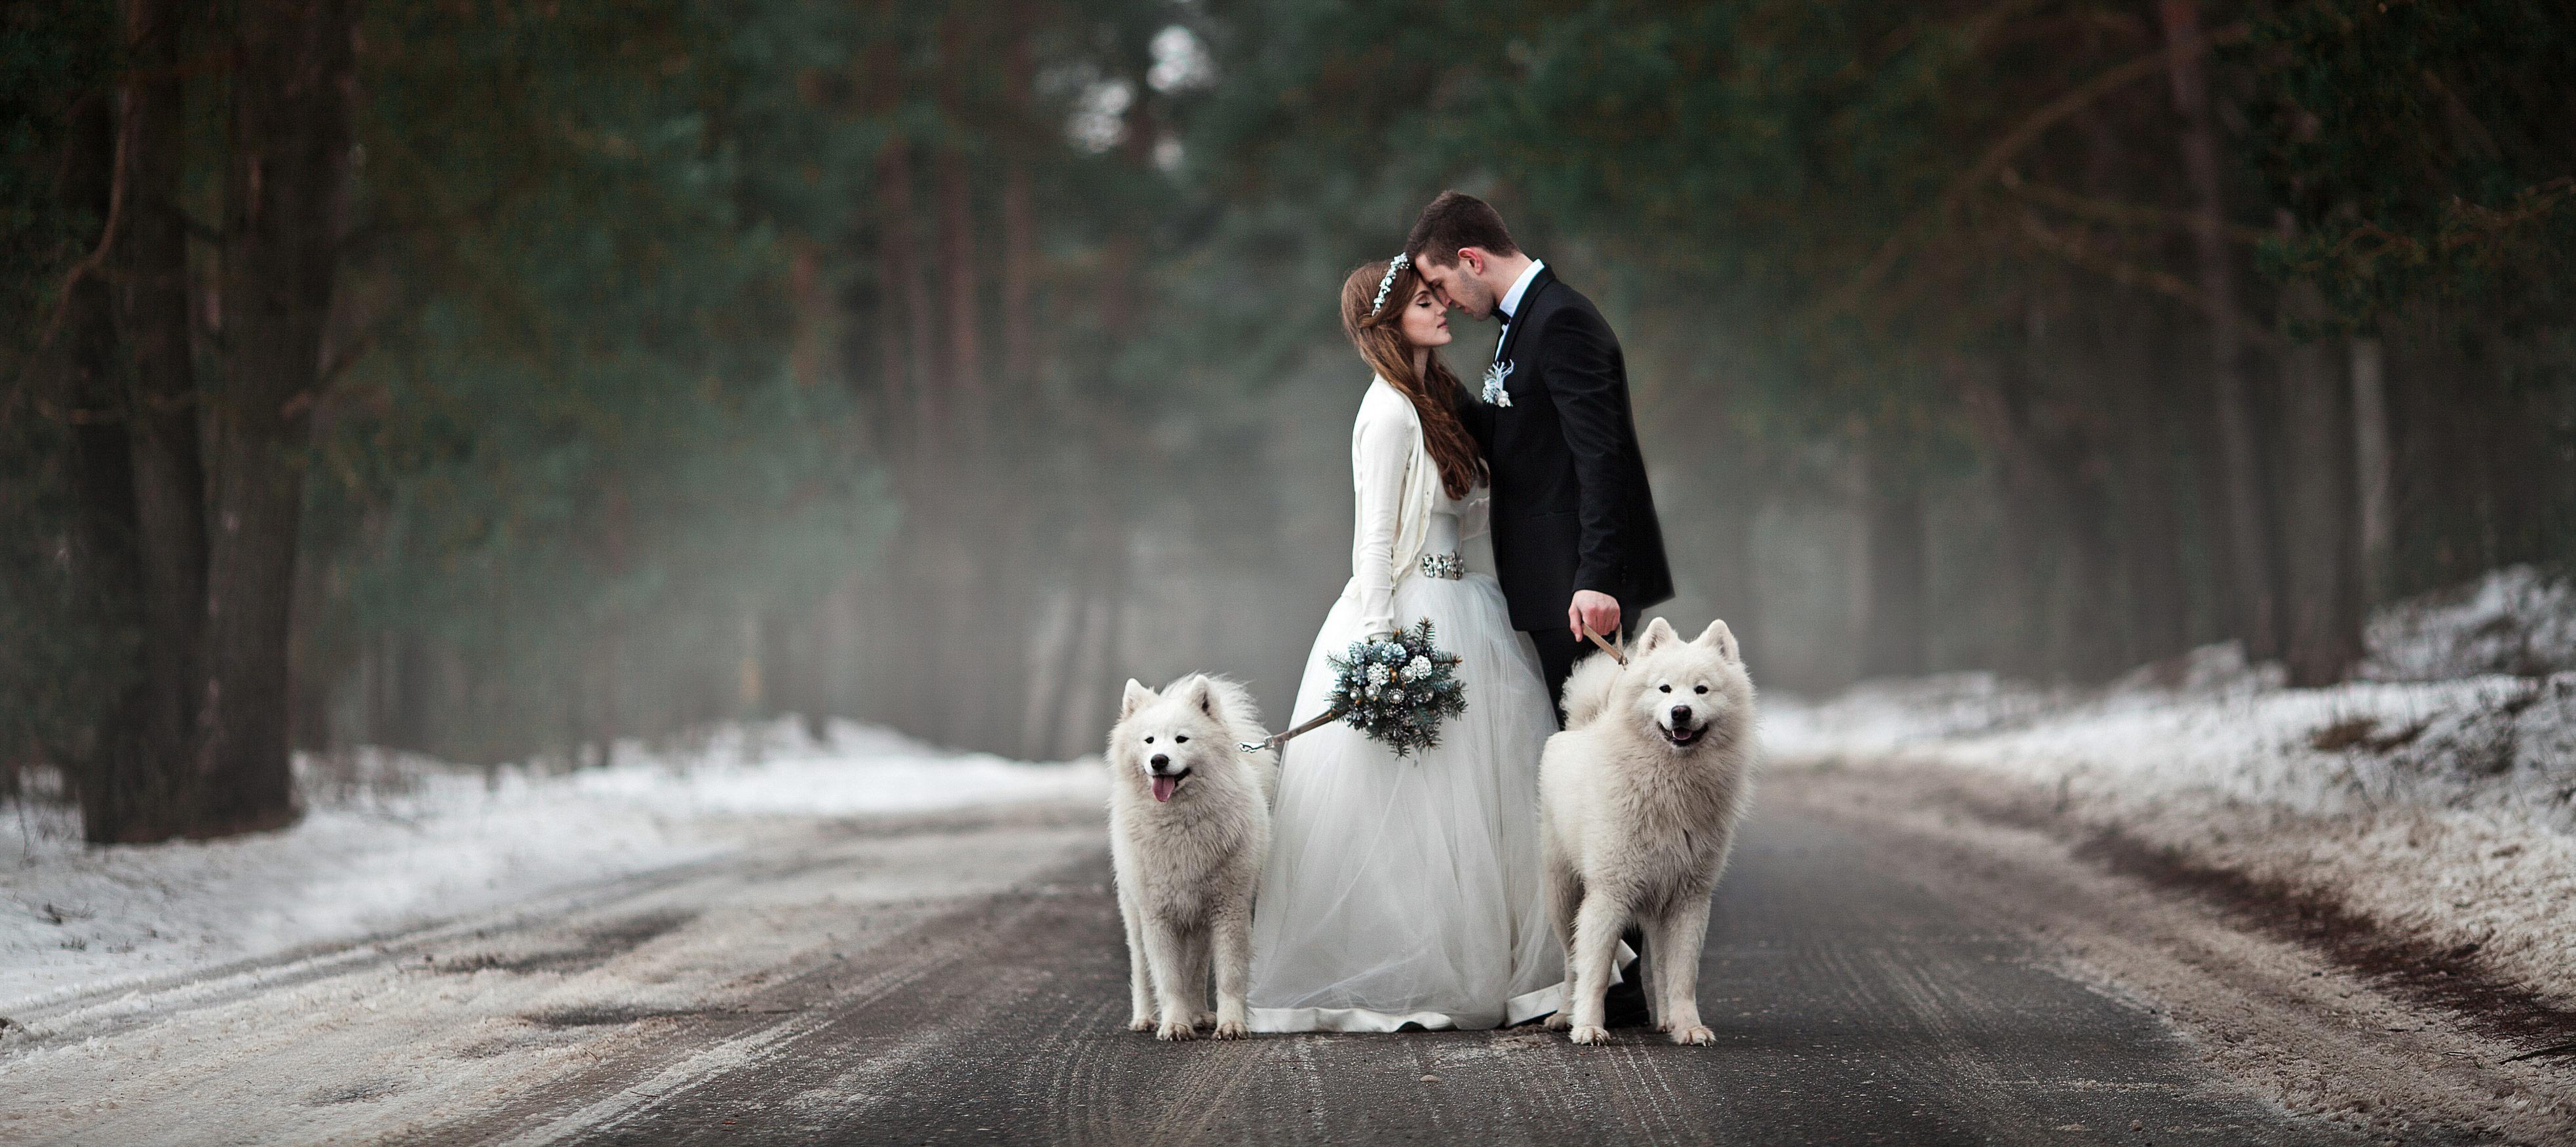 Wedding Escort